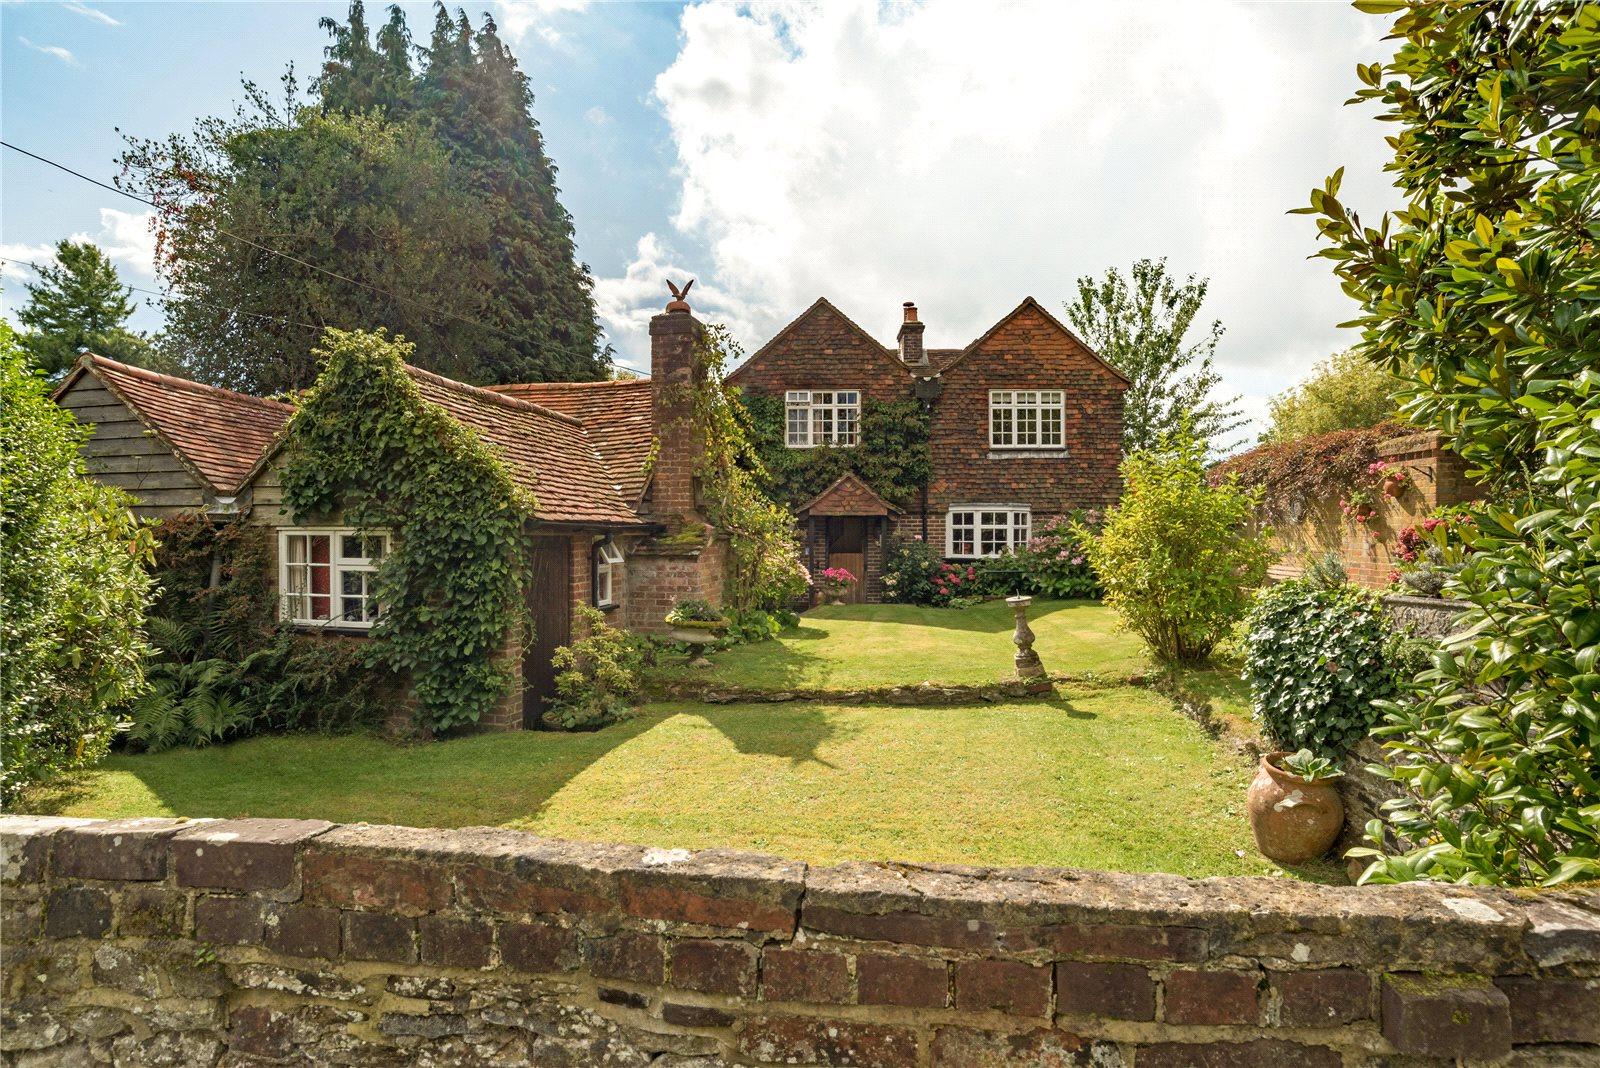 Villa per Vendita alle ore Dye House Road, Thursley, Godalming, Surrey, GU8 Godalming, Inghilterra